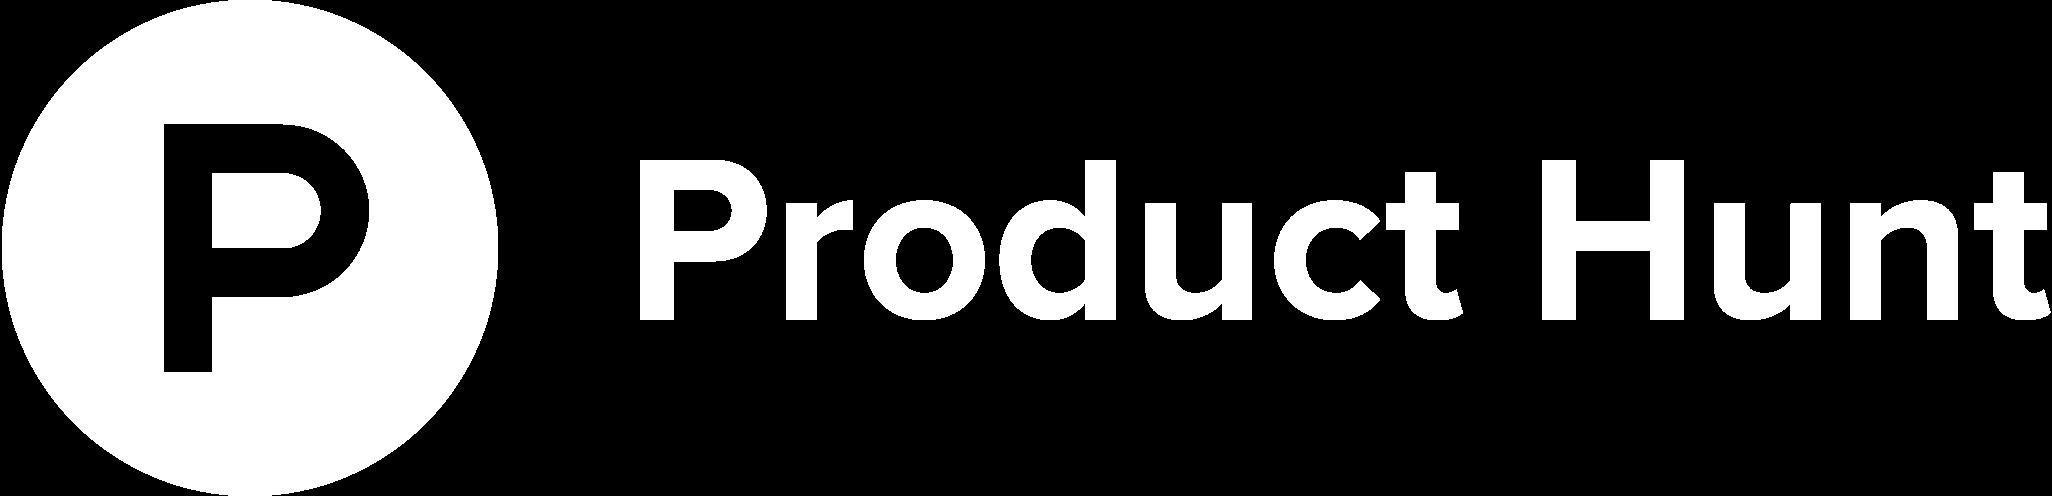 Product Hunt